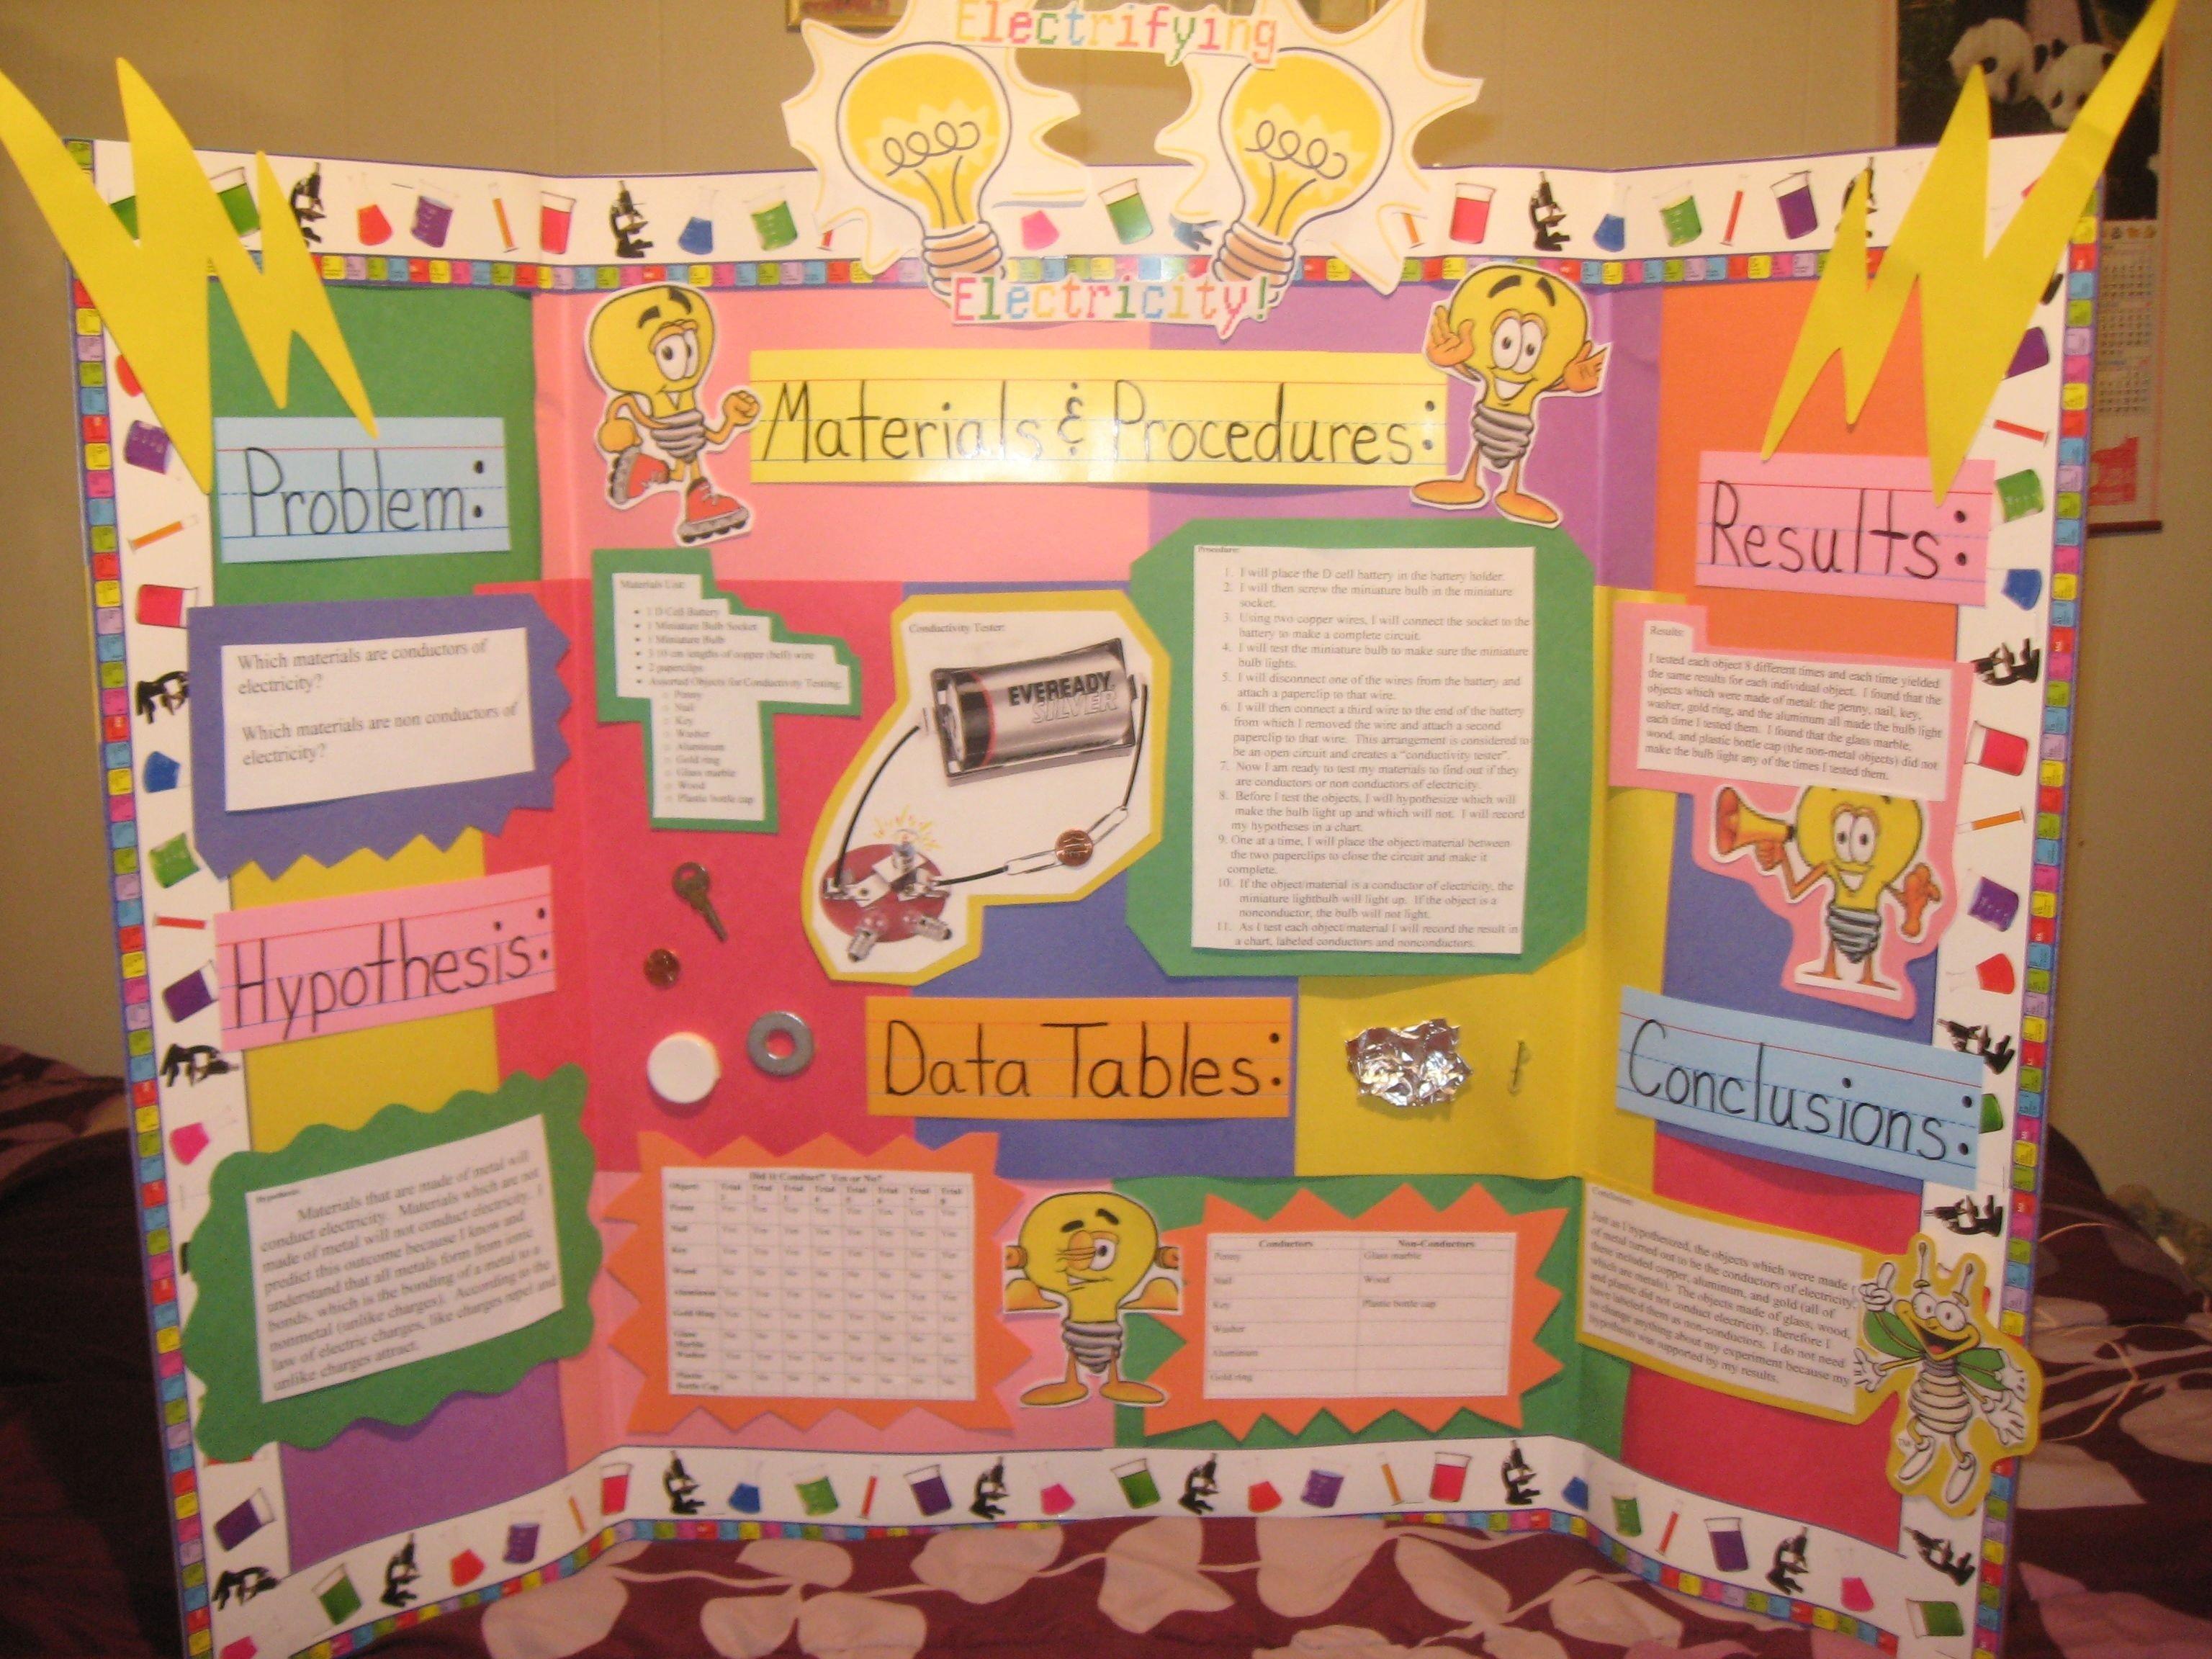 10 Lovable Kindergarten Science Fair Project Ideas science fair project electrify electricity fun stuff for kids 1 2020